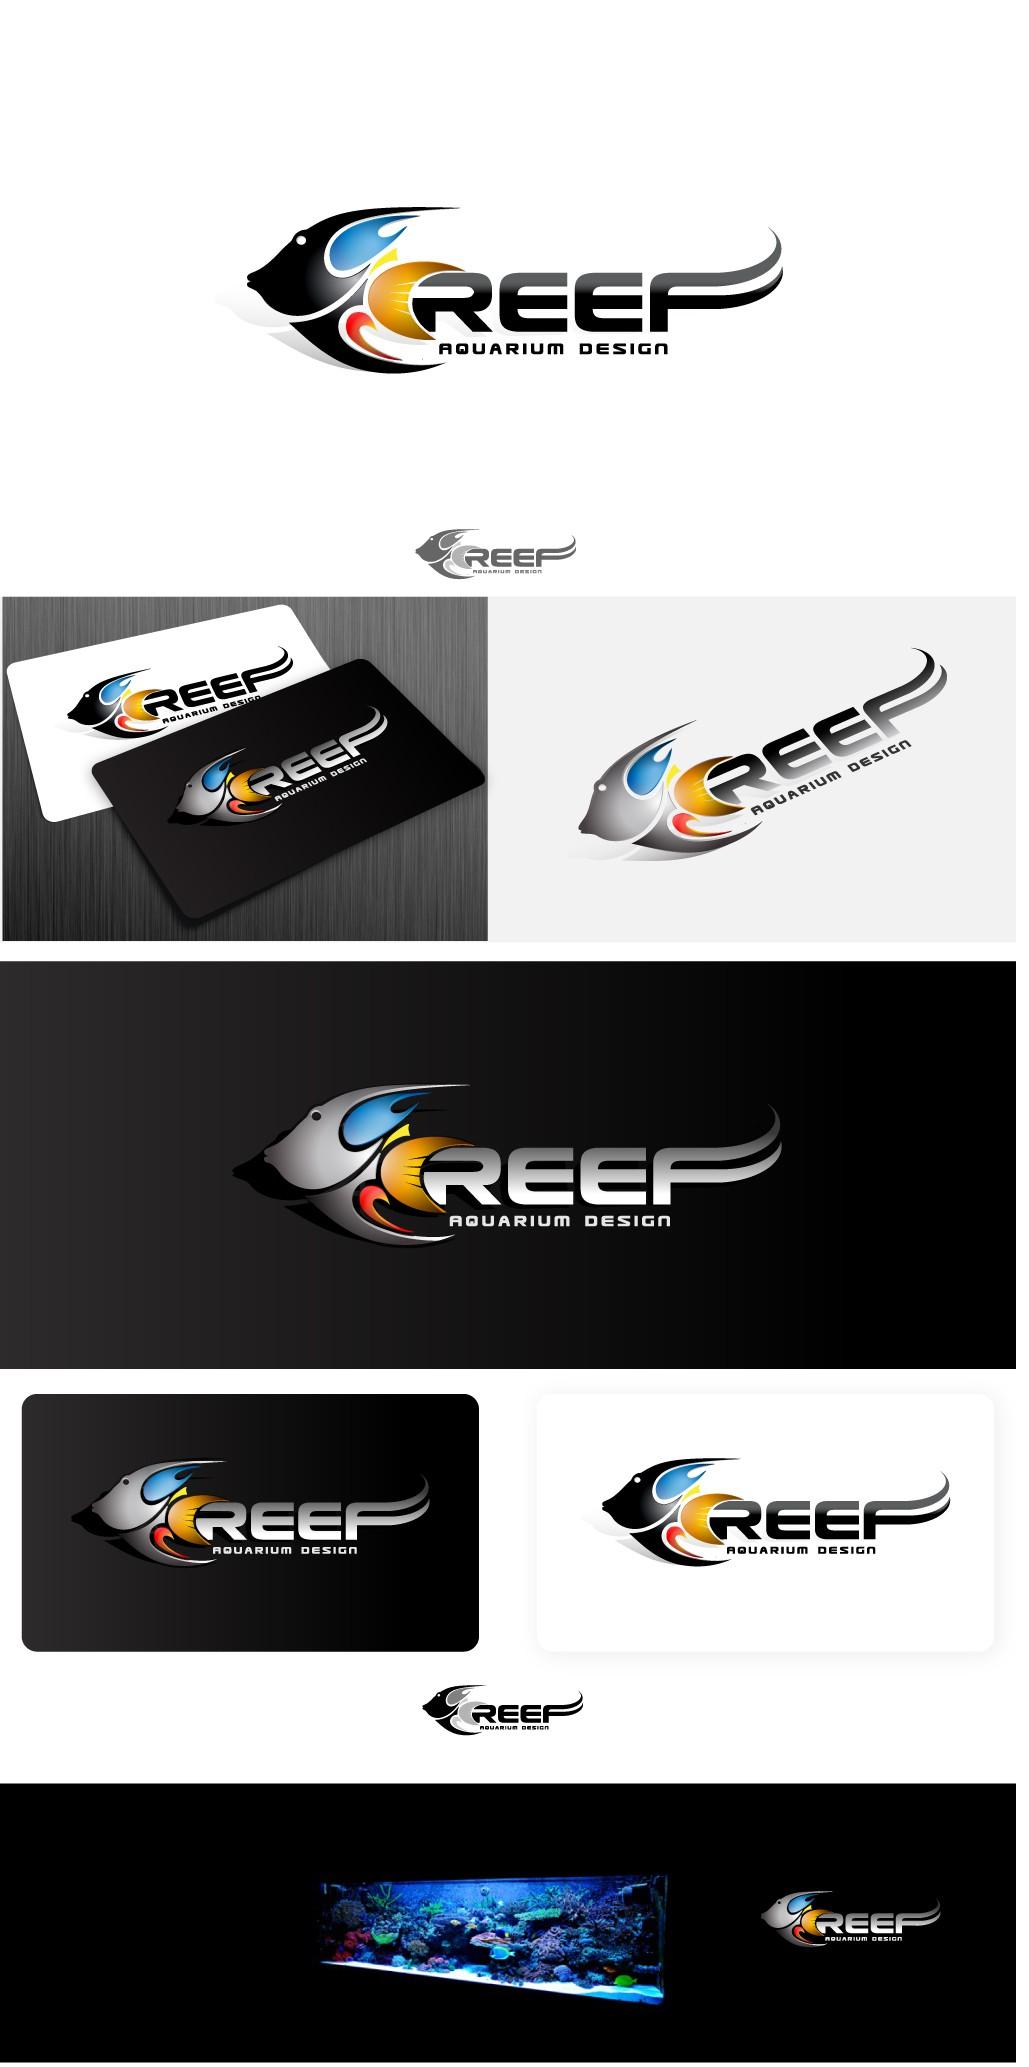 Reef Aquarium Design needs a new logo